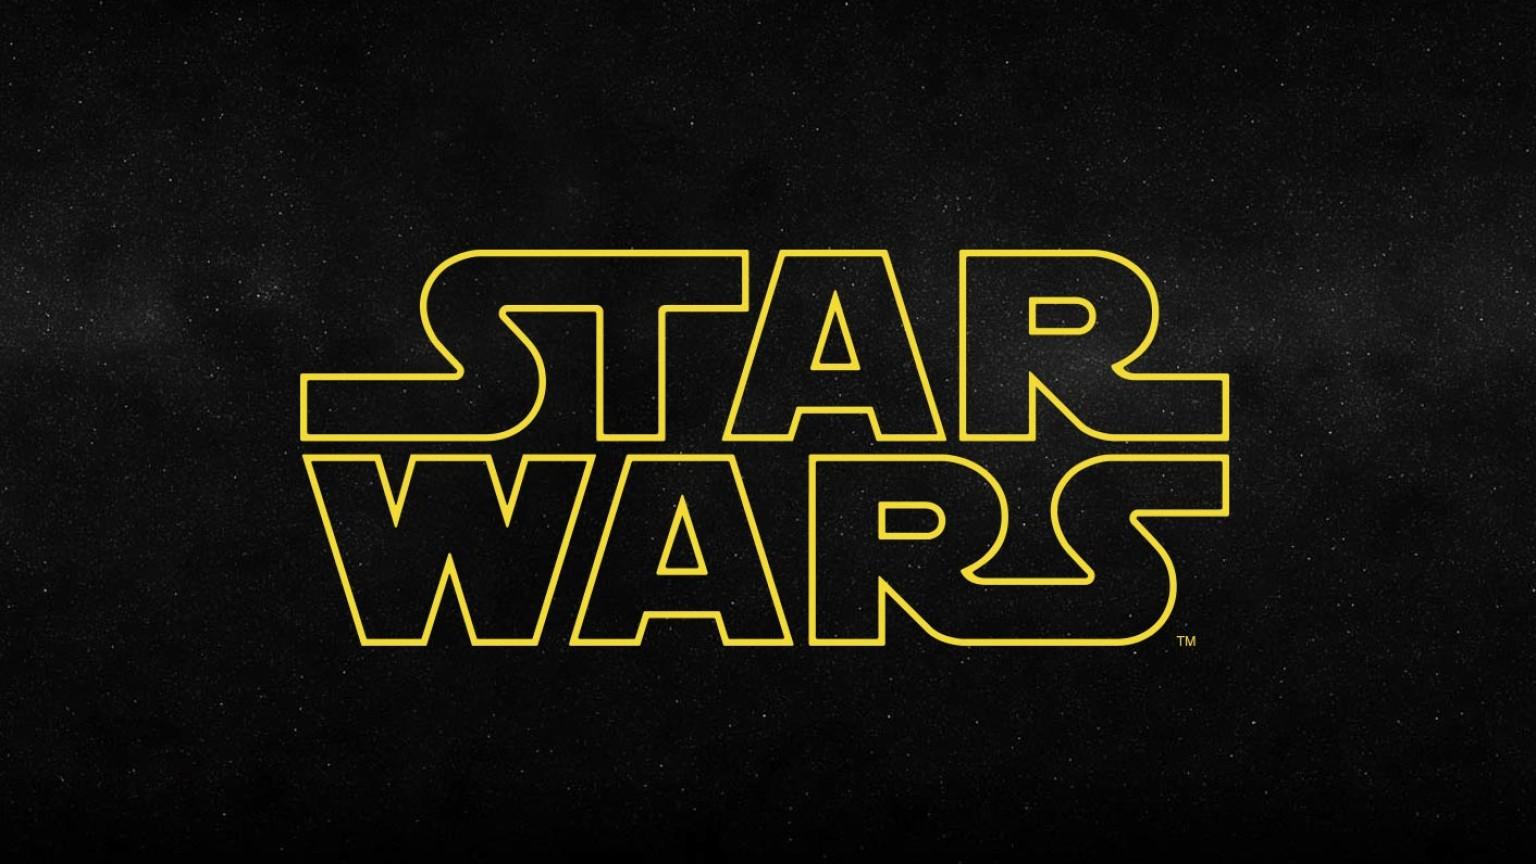 Star Wars encontra Batman em novo vídeo promocional